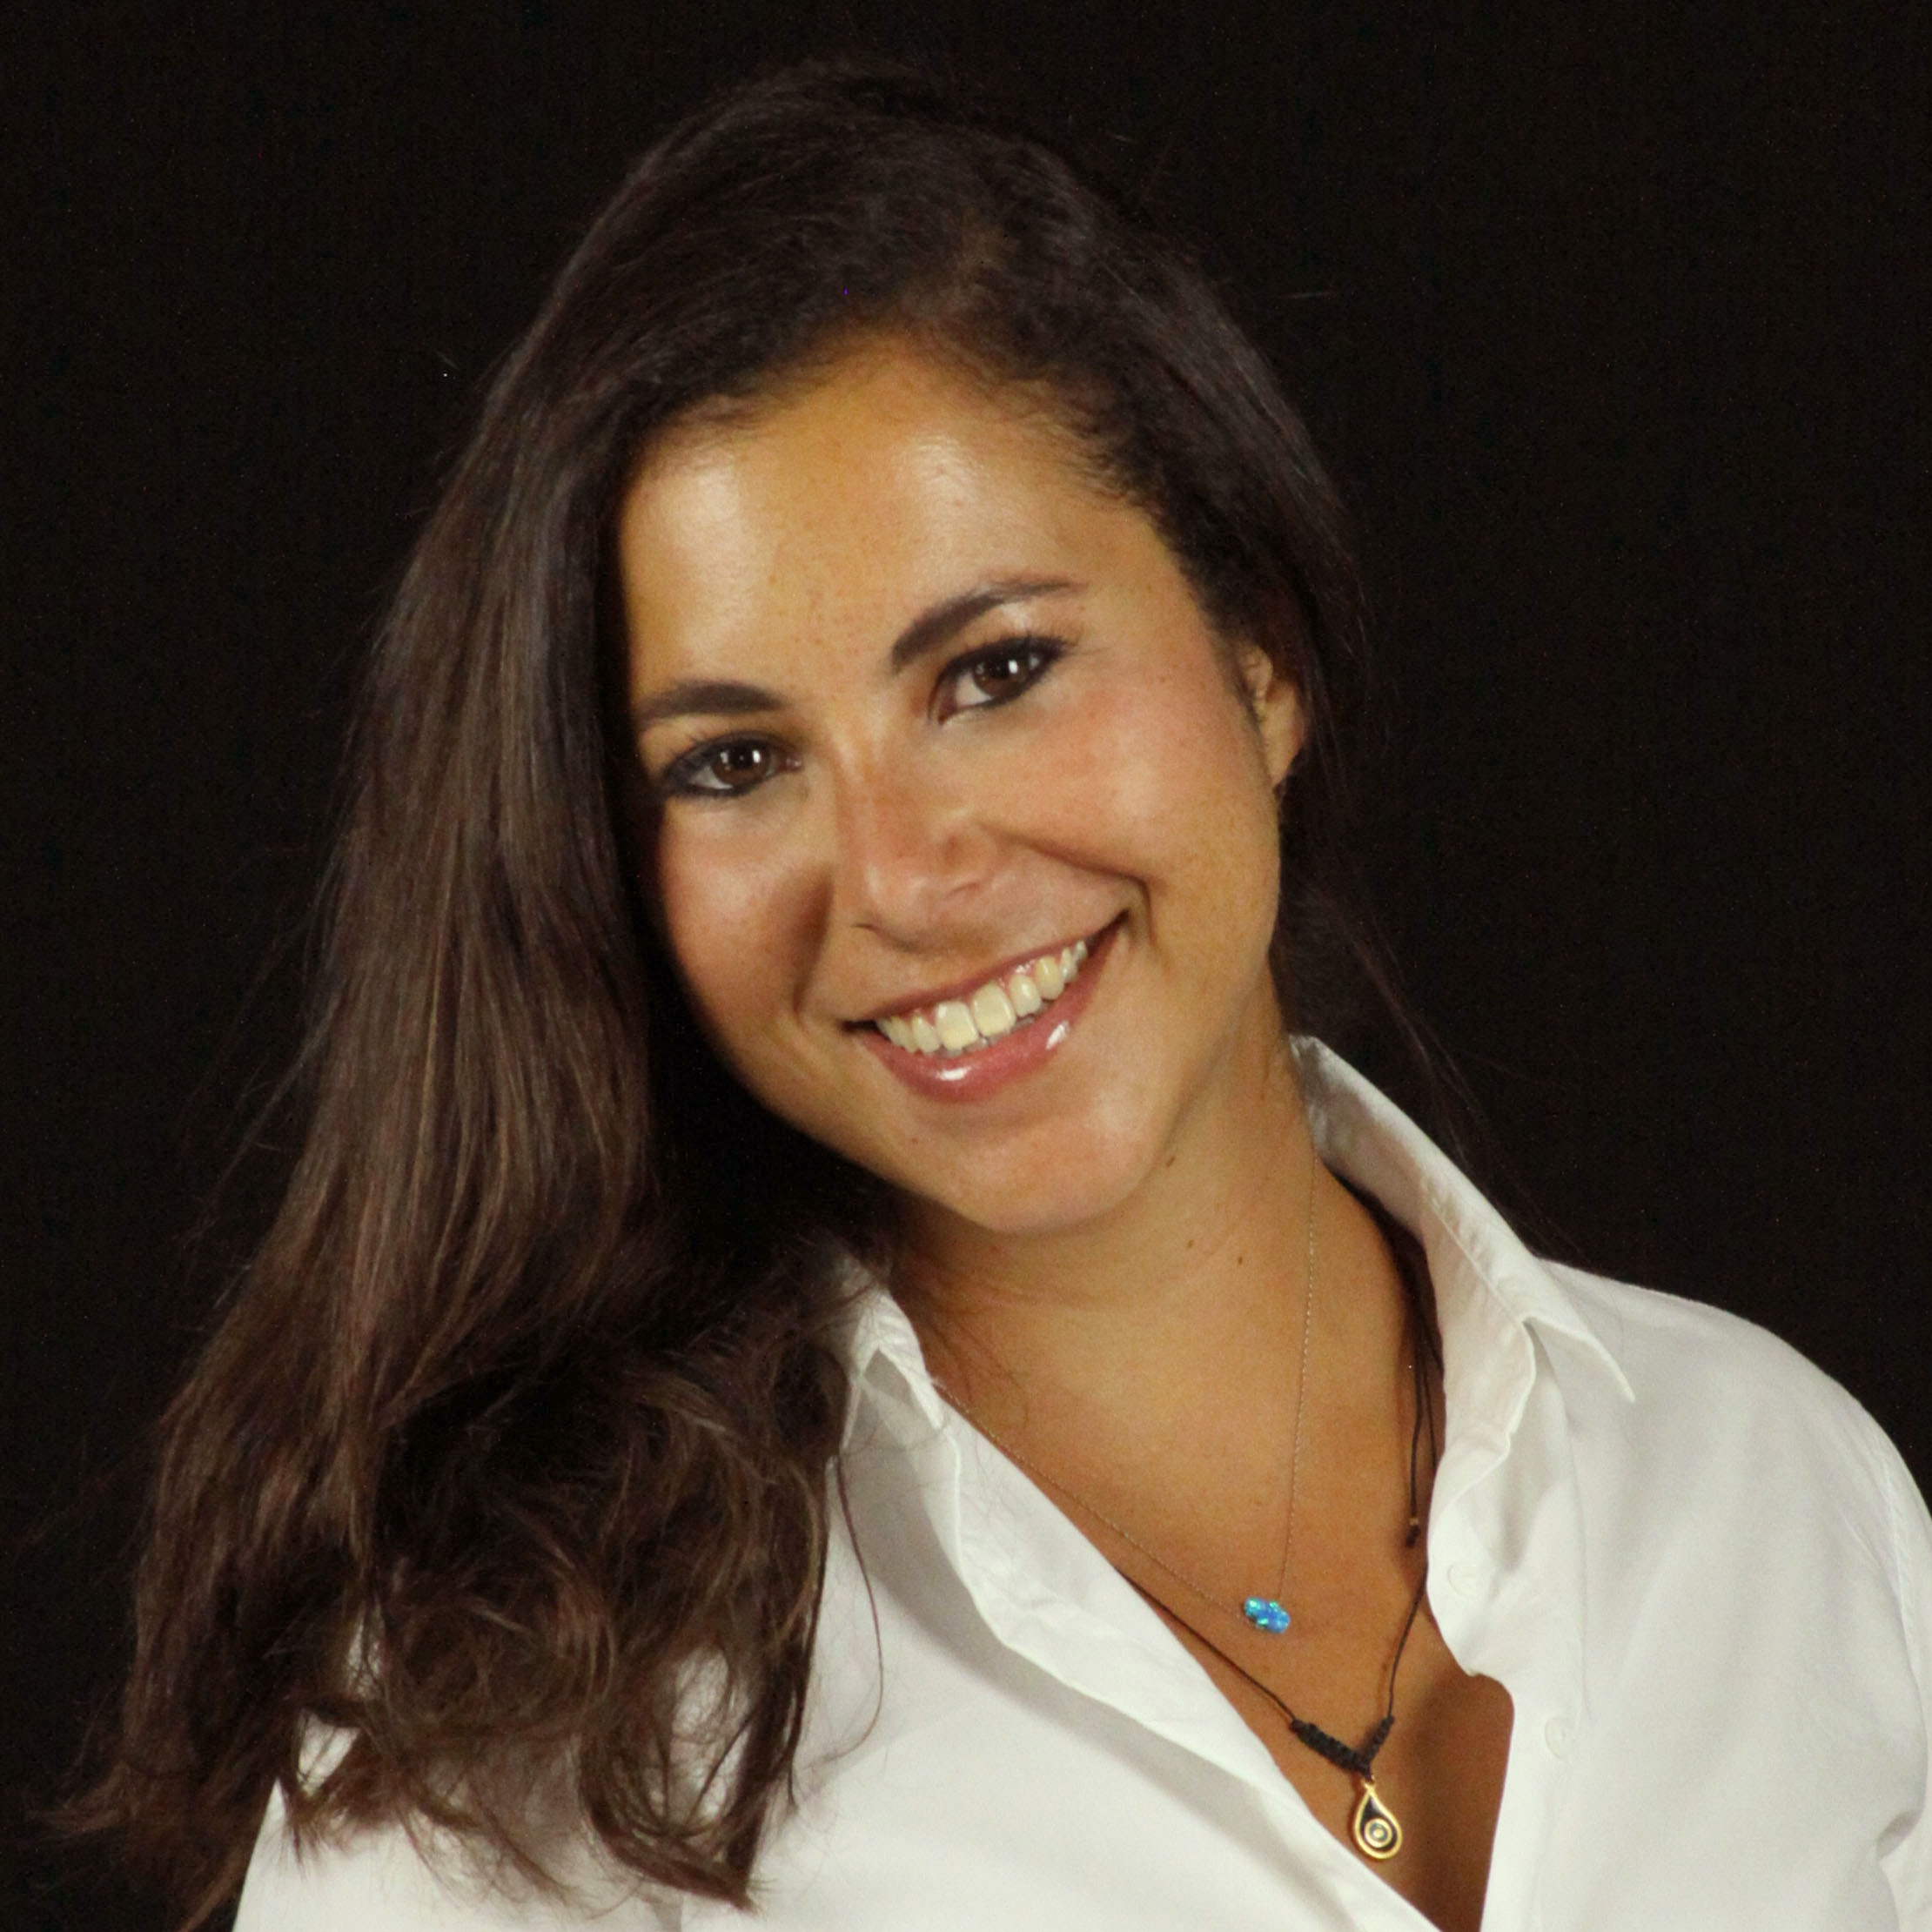 Christiana Syrris